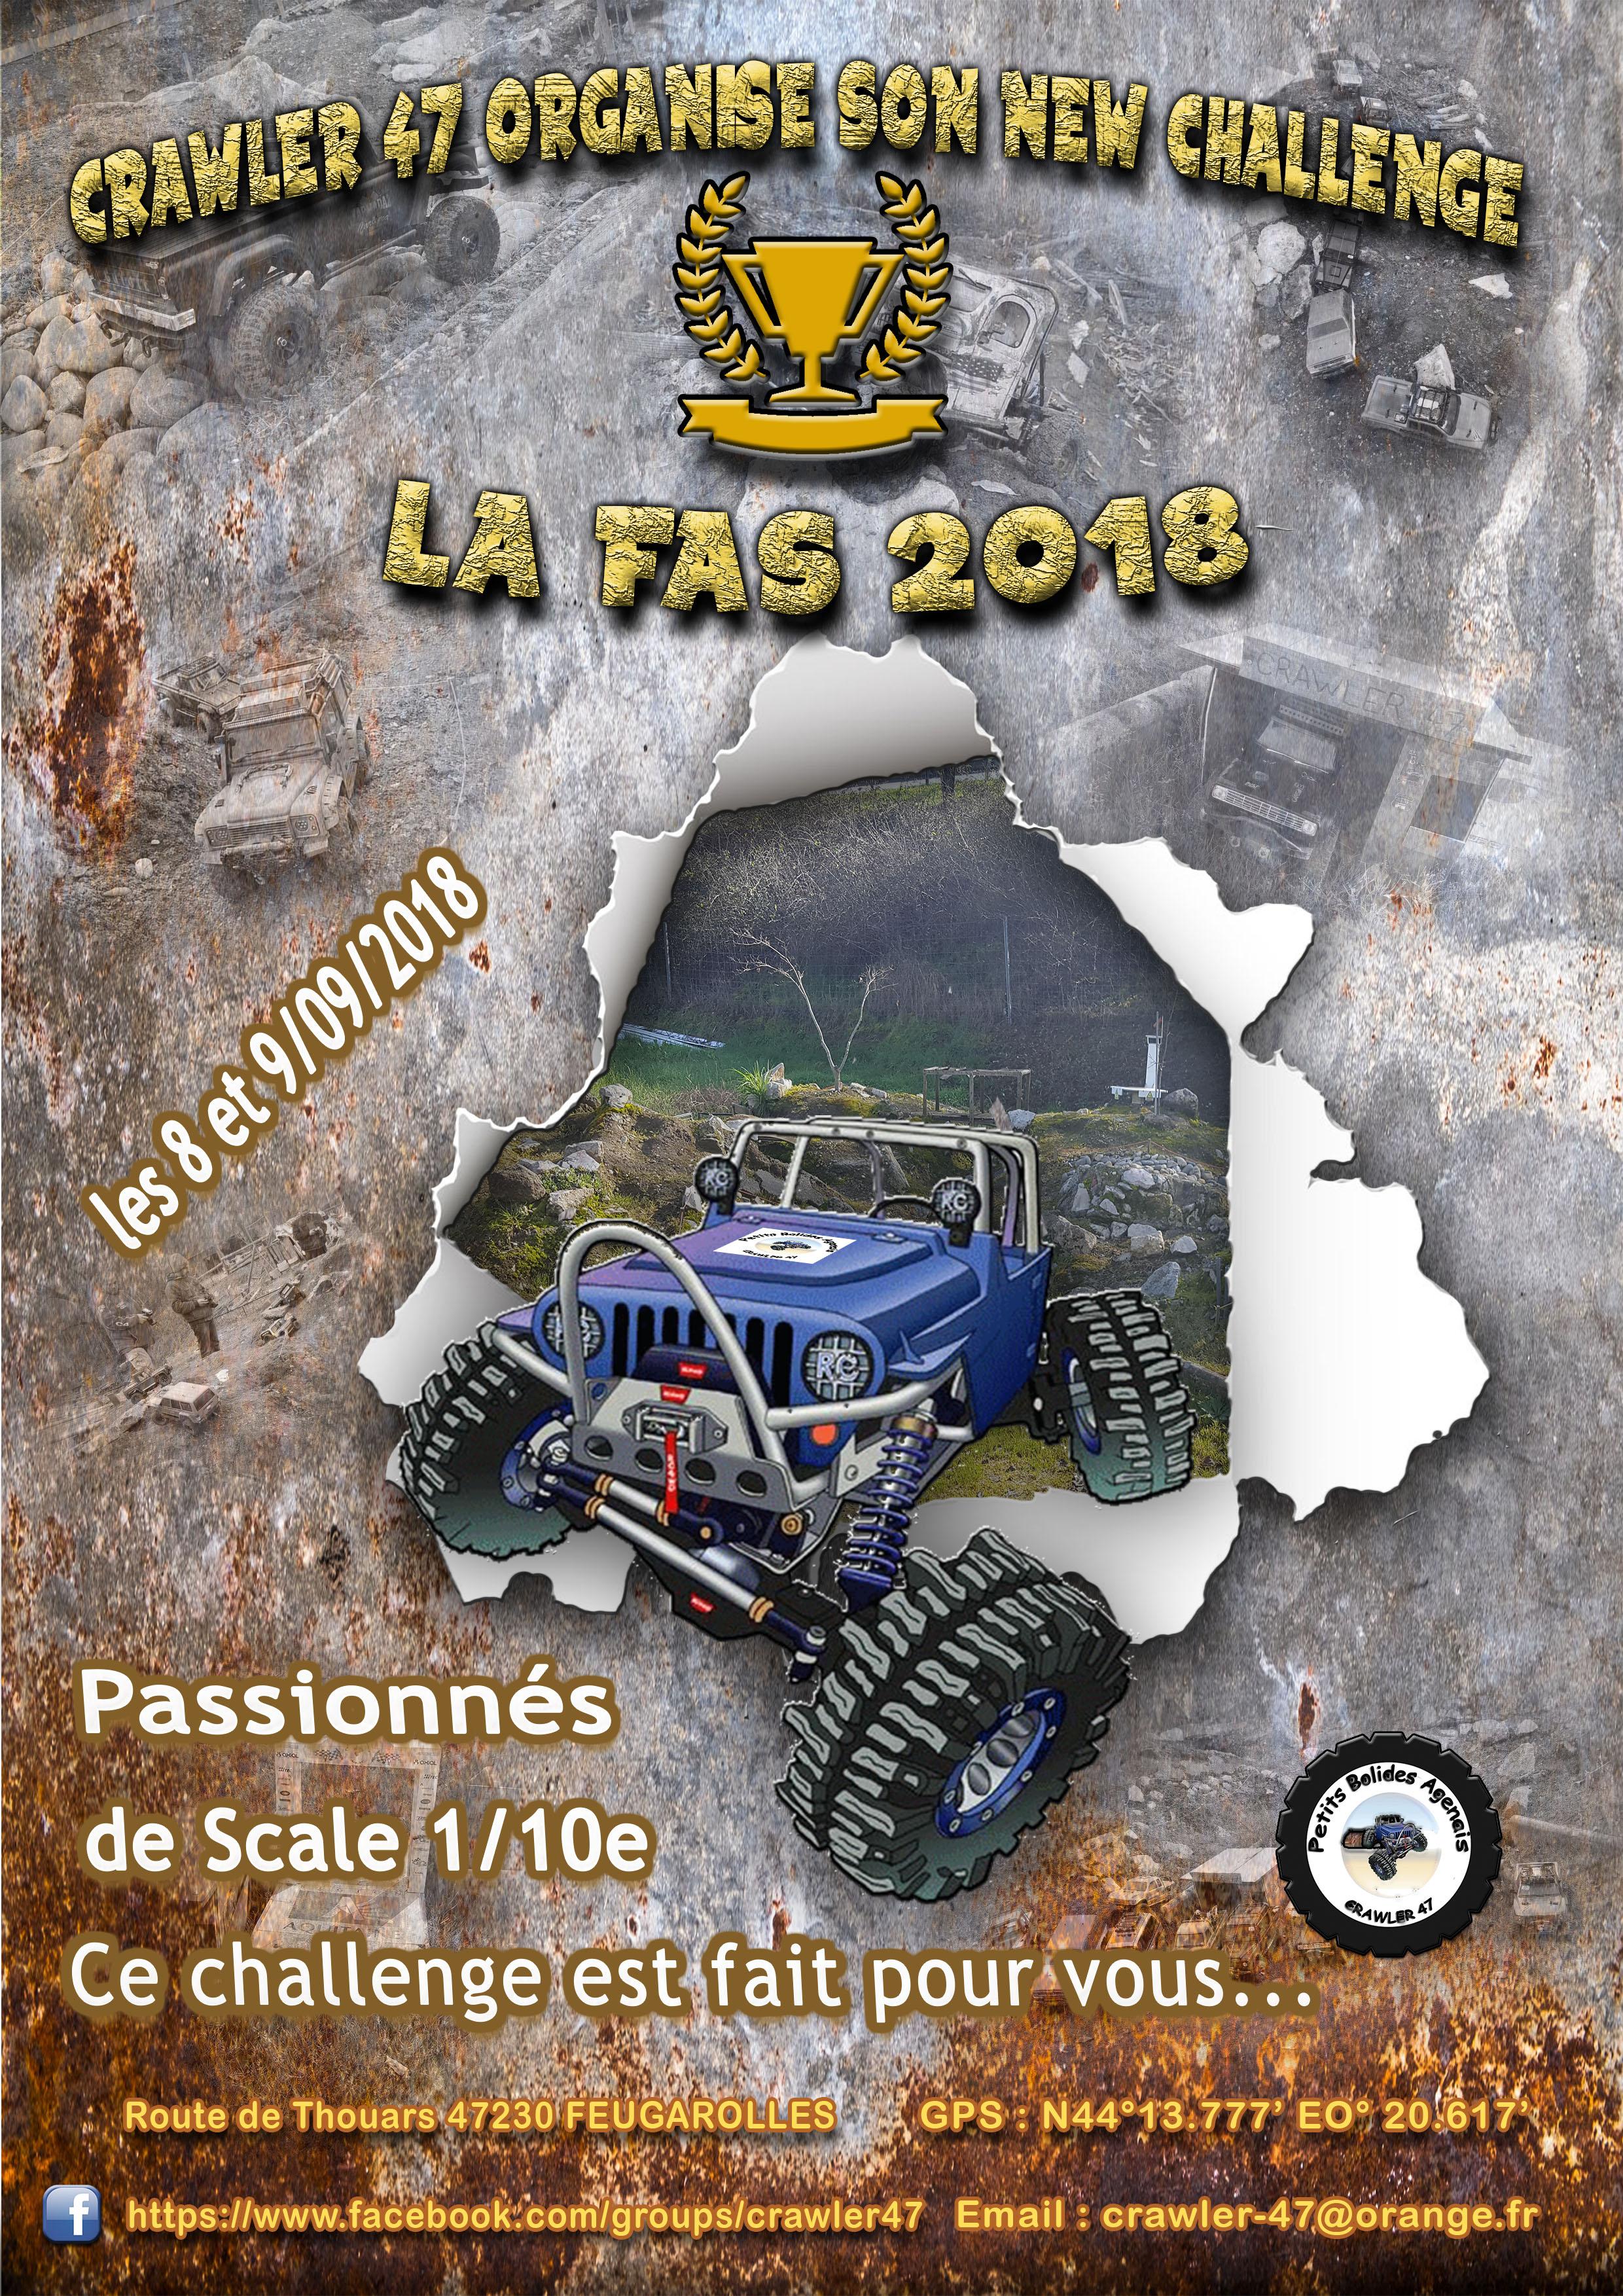 La FAS 2018 - NEW CHALLENGE Crawler 47 180214112534748499